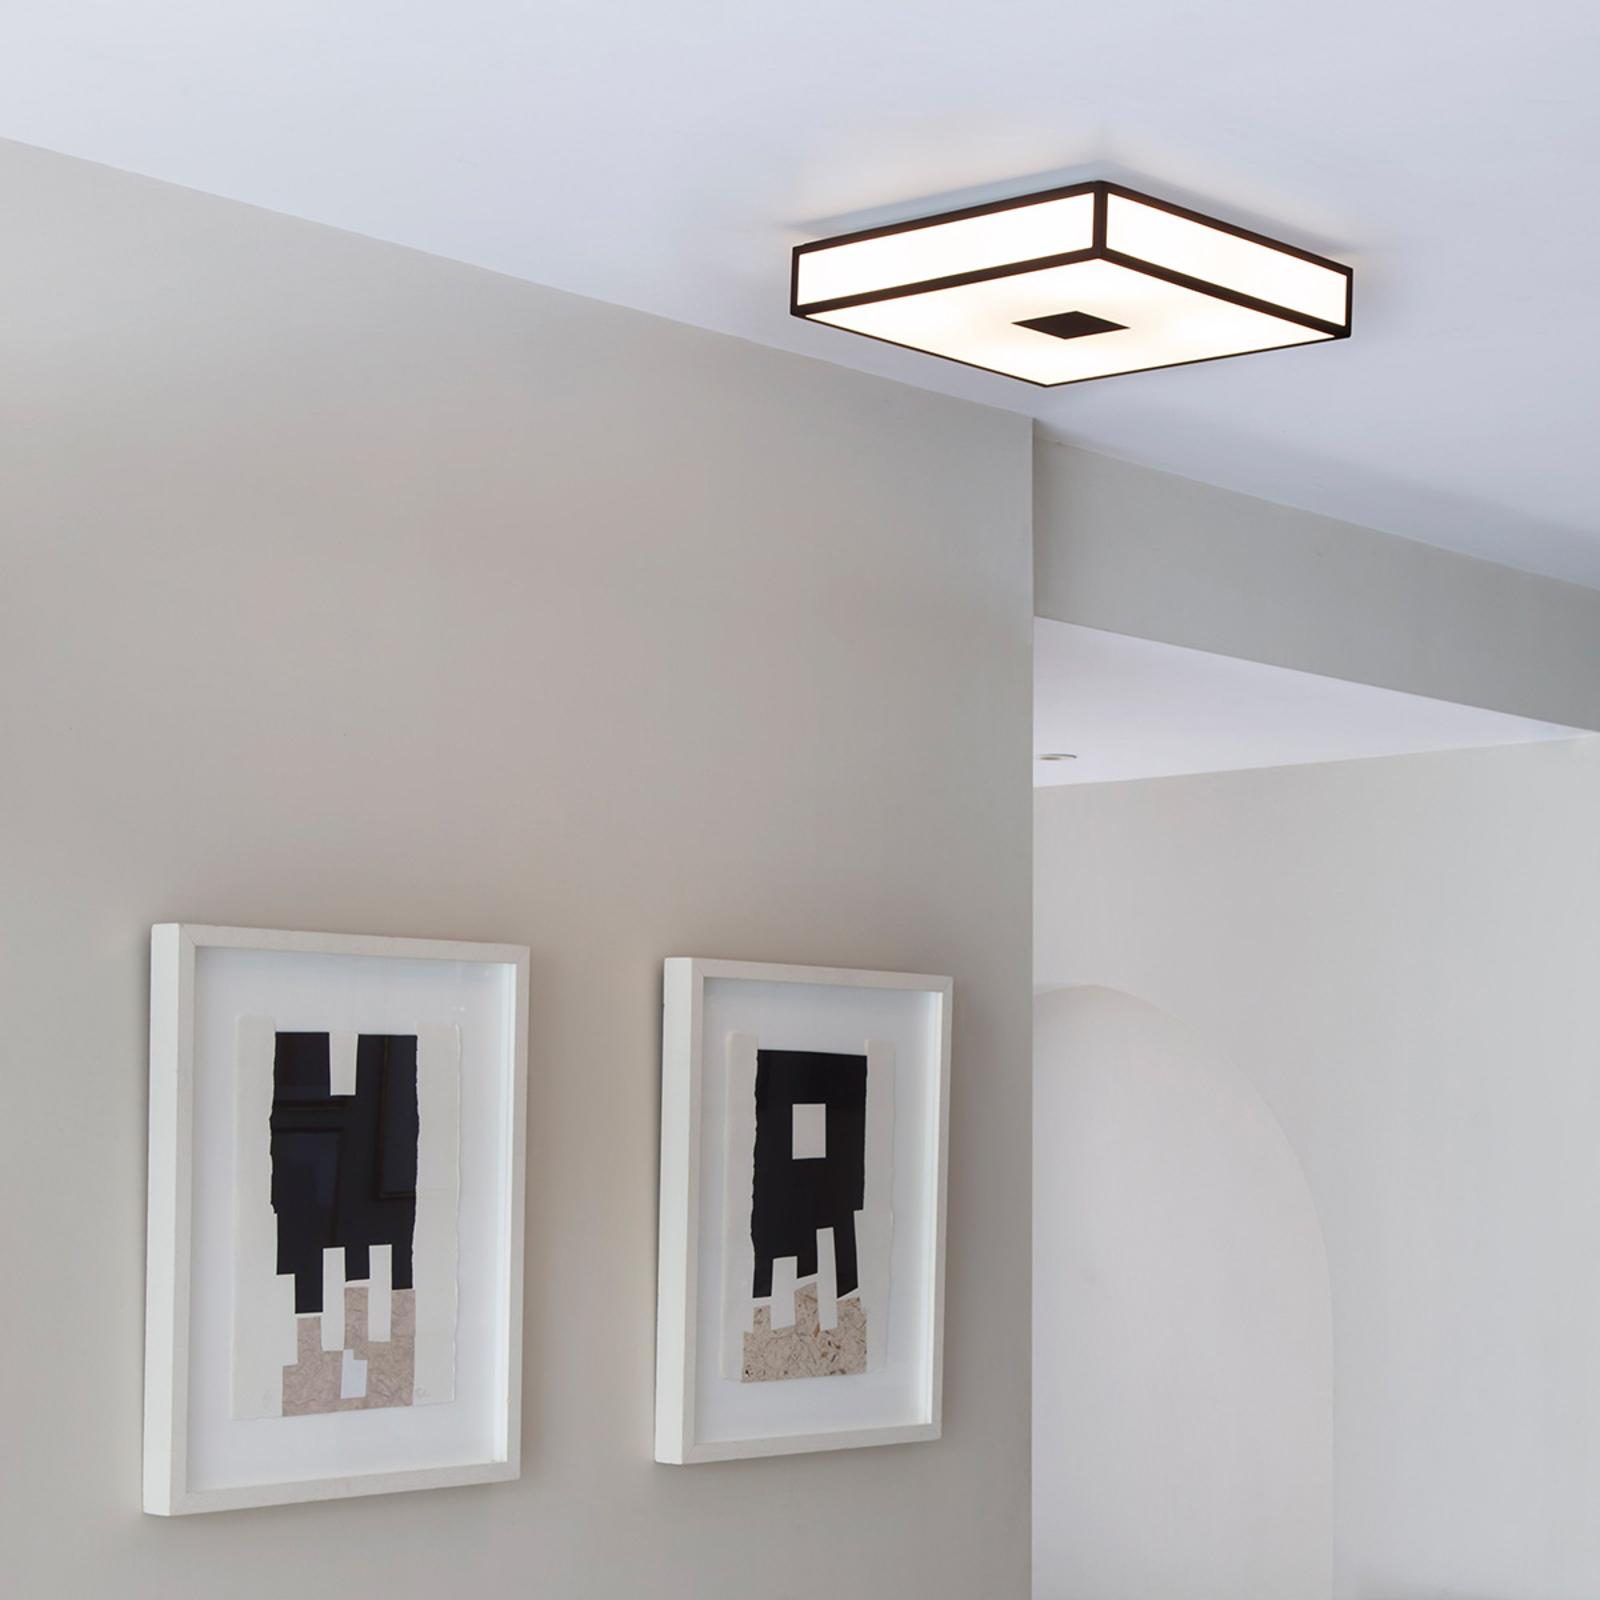 Moderne MASHIKO loftlampe på 40 x 40 cm i bronze